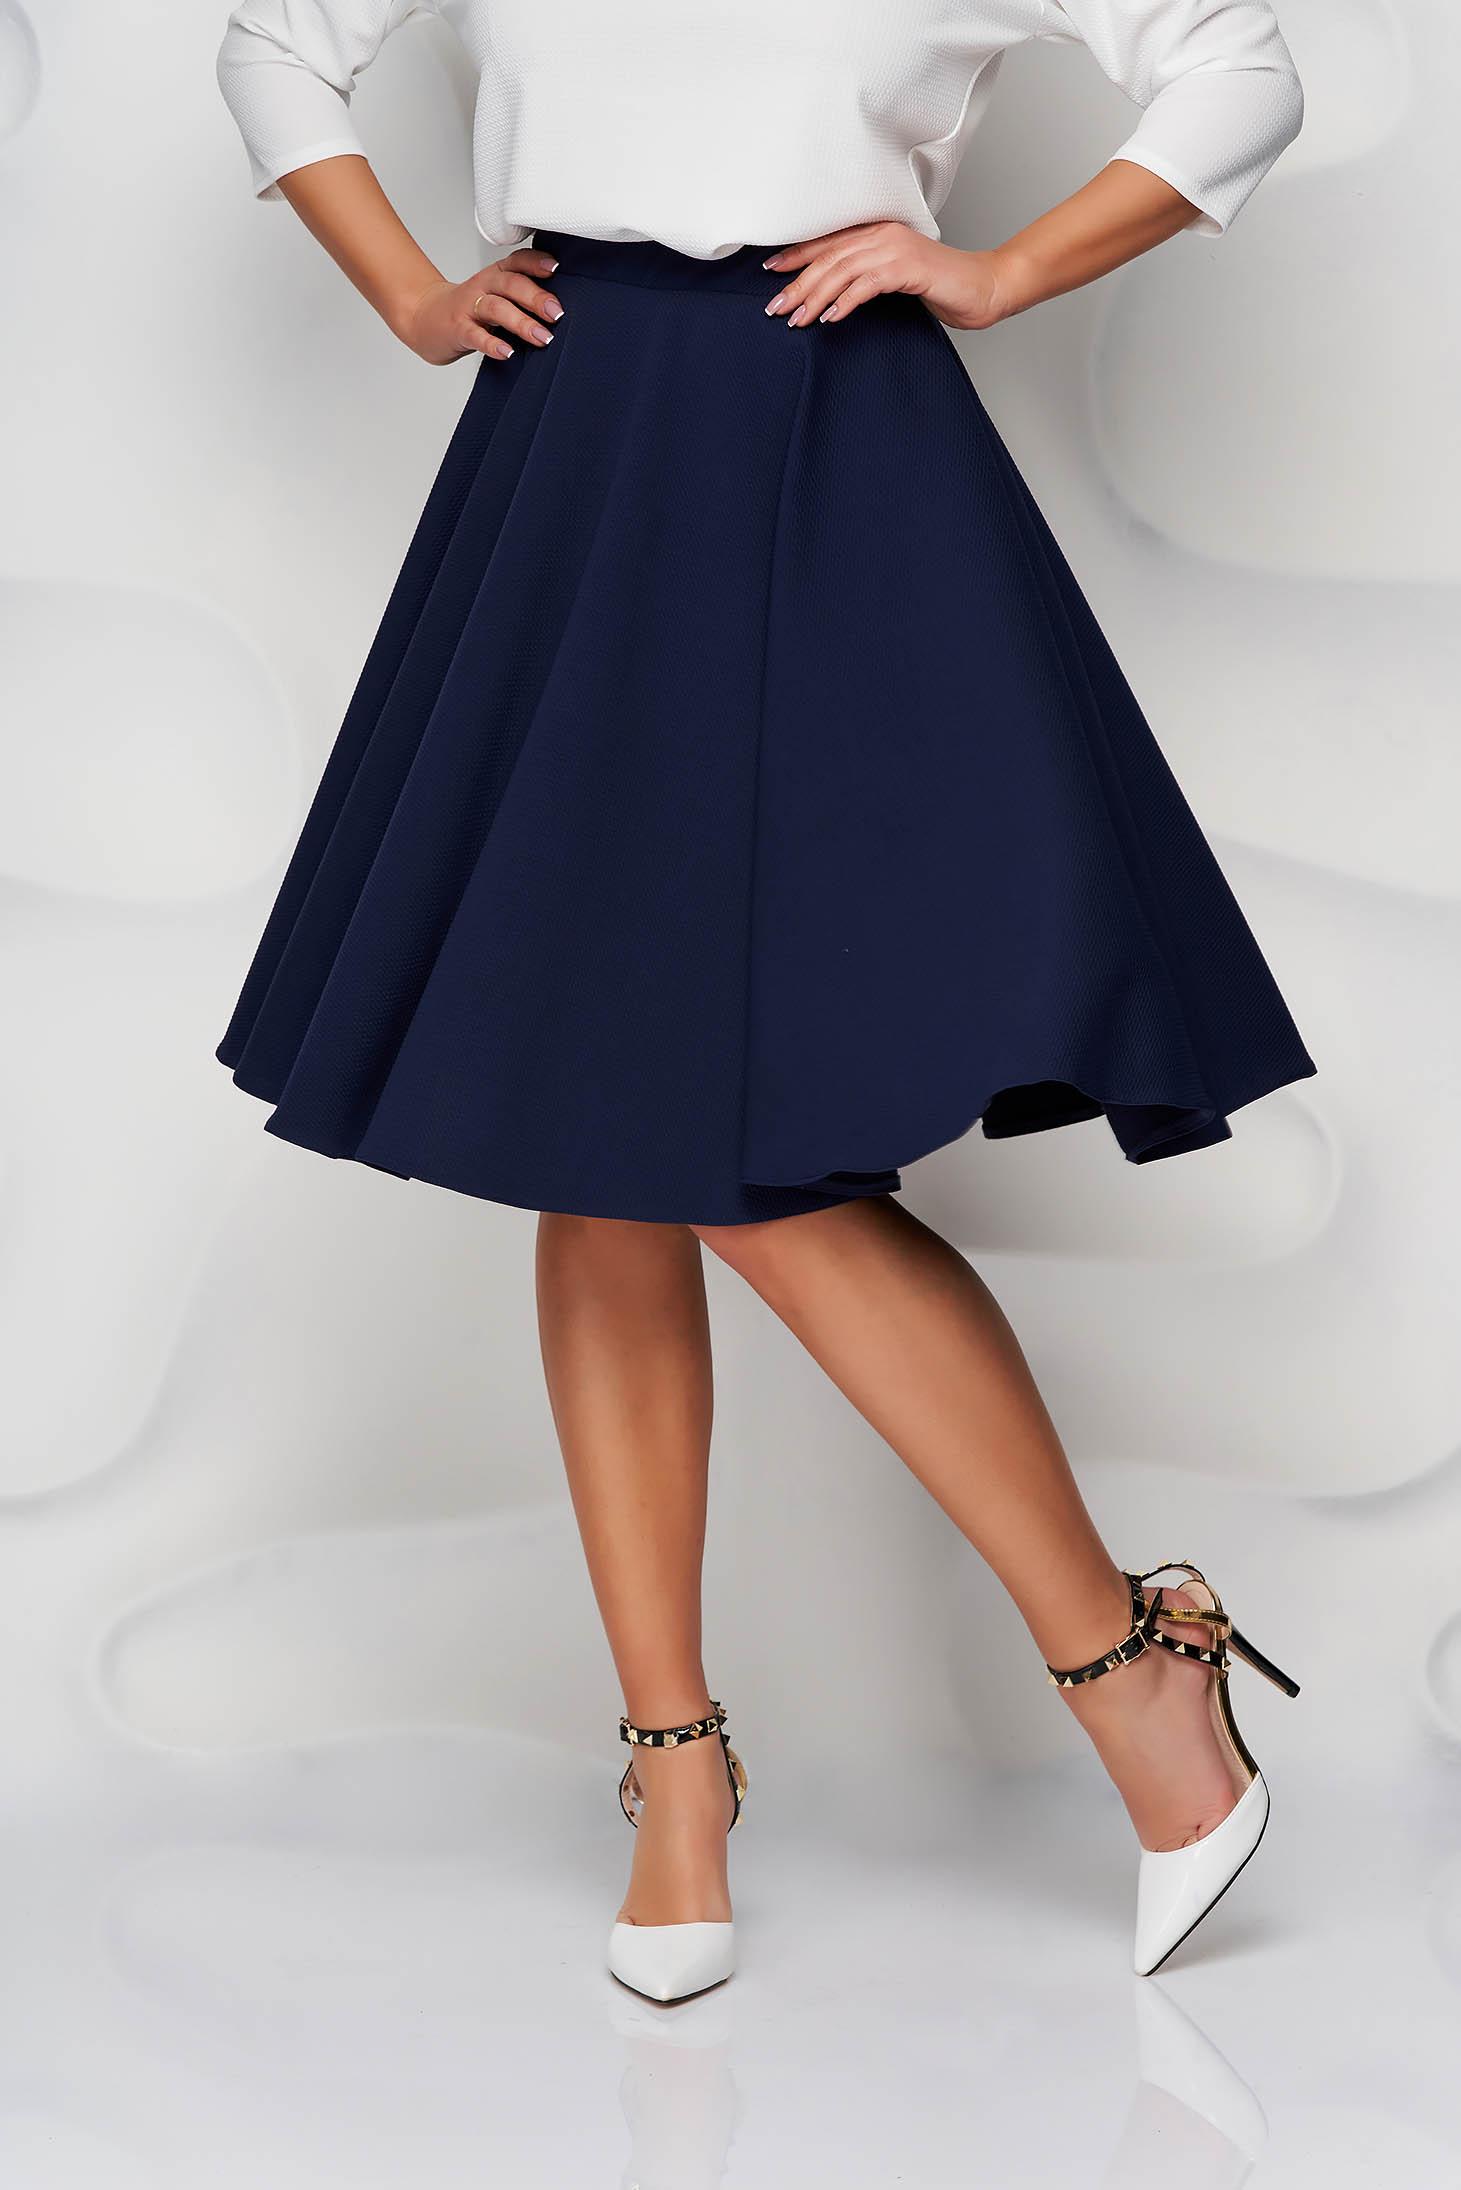 StarShinerS darkblue skirt cloche high waisted from elastic fabric